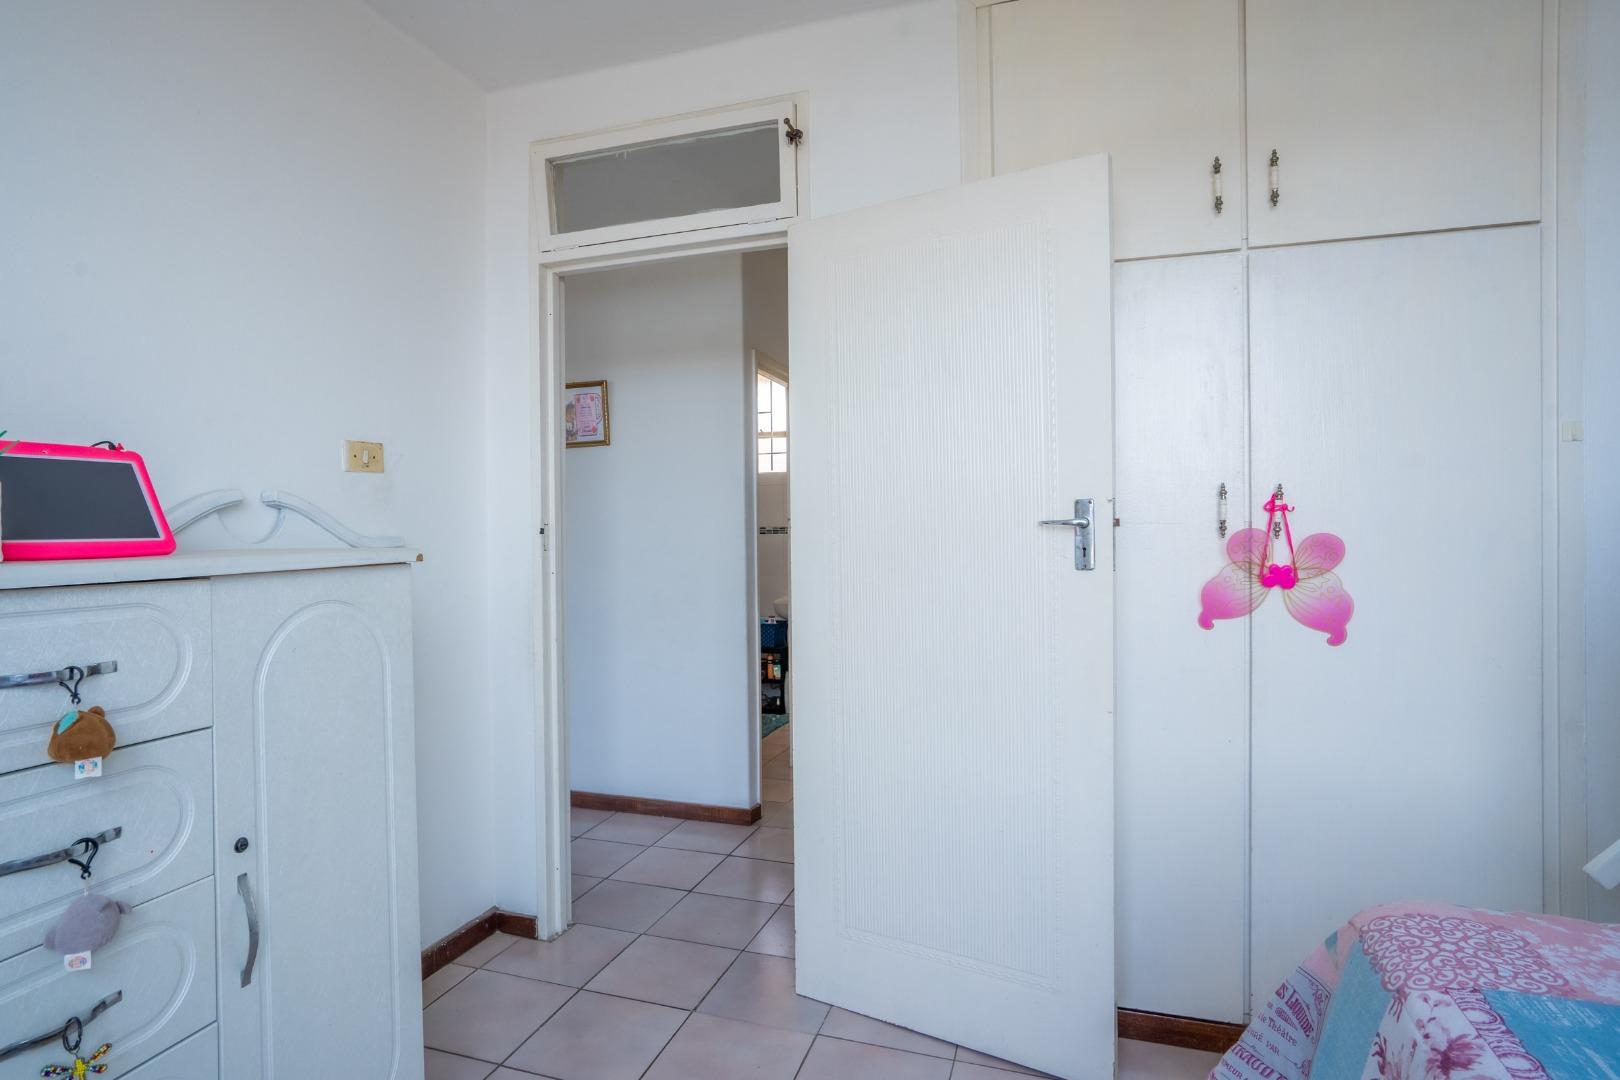 2 Bedroom Apartment / Flat For Sale in Glenwood